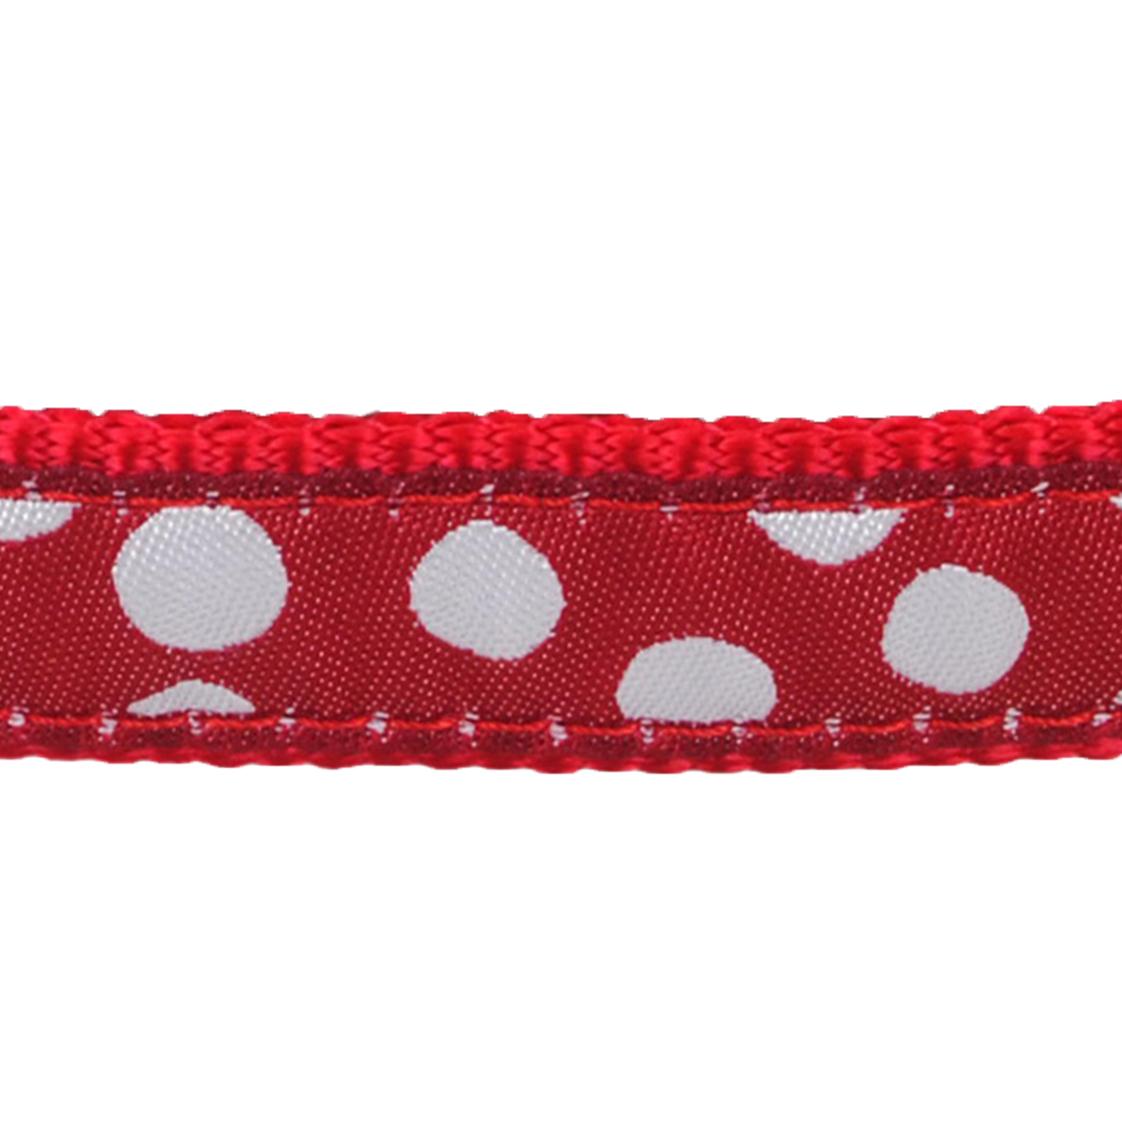 Glitter Dog Collars Uk